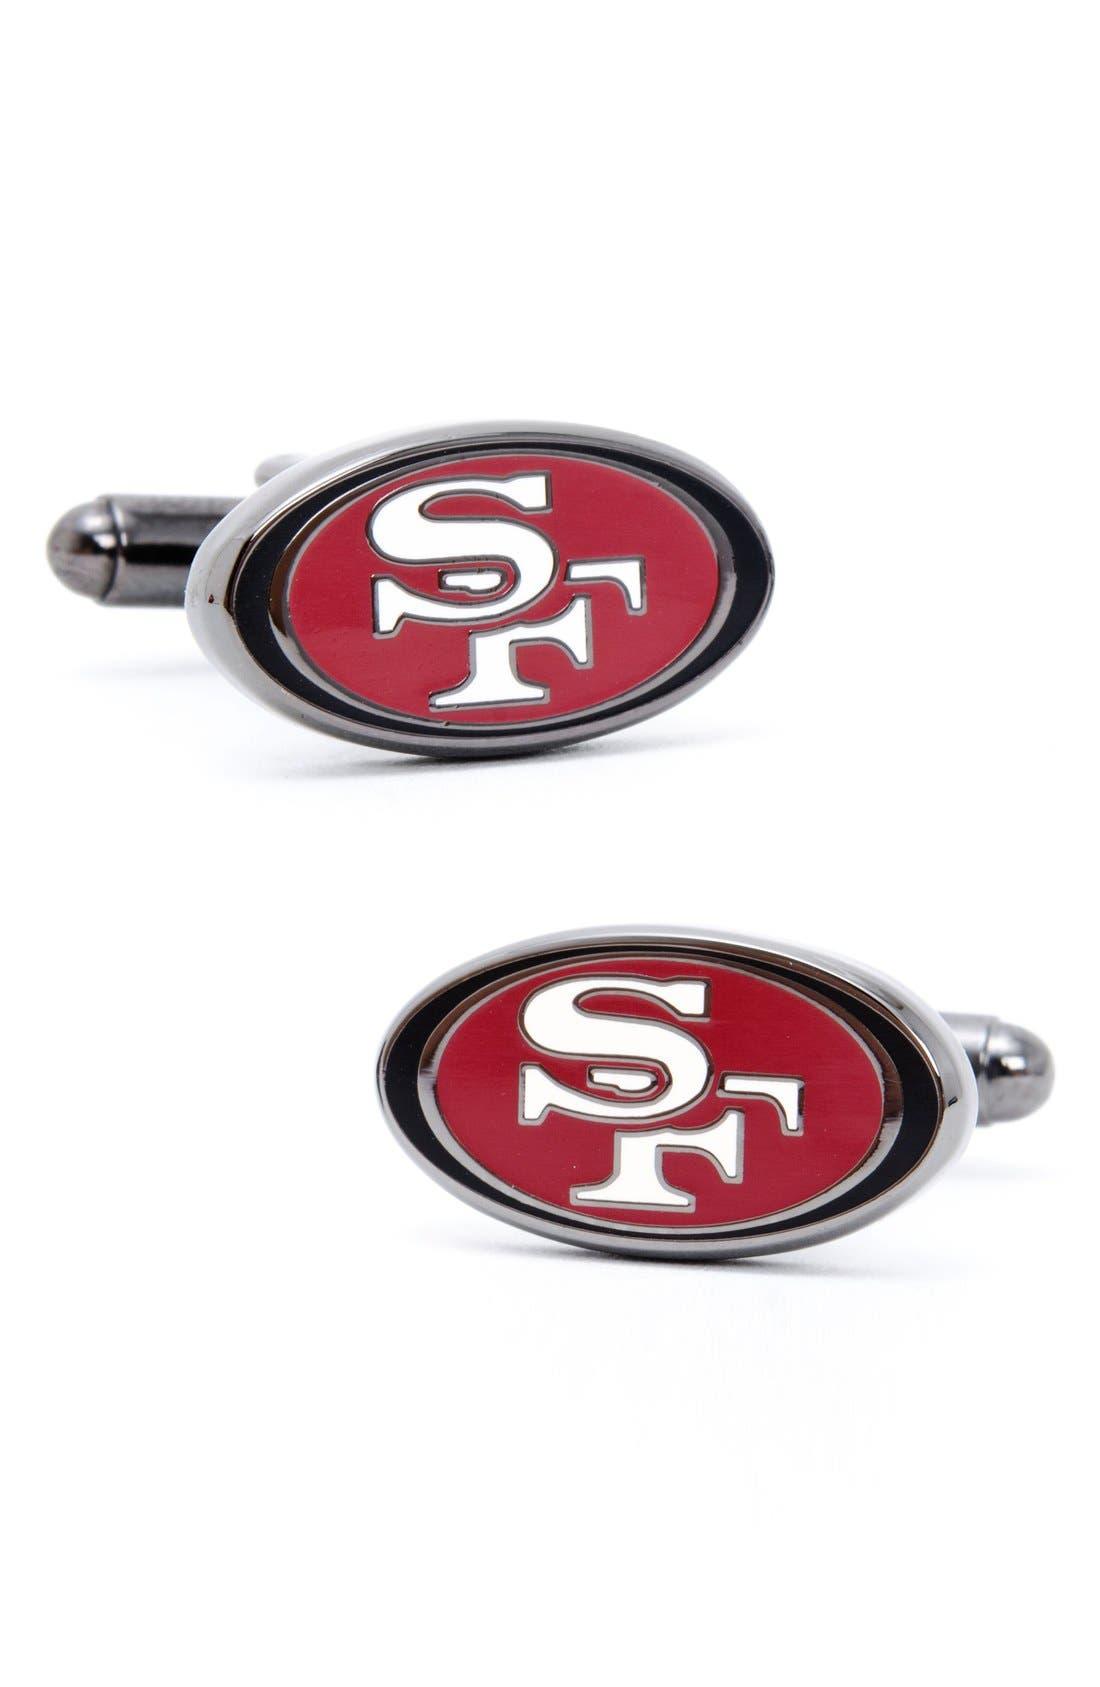 CUFFLINKS, INC. San Francisco 49ers Cuff Links